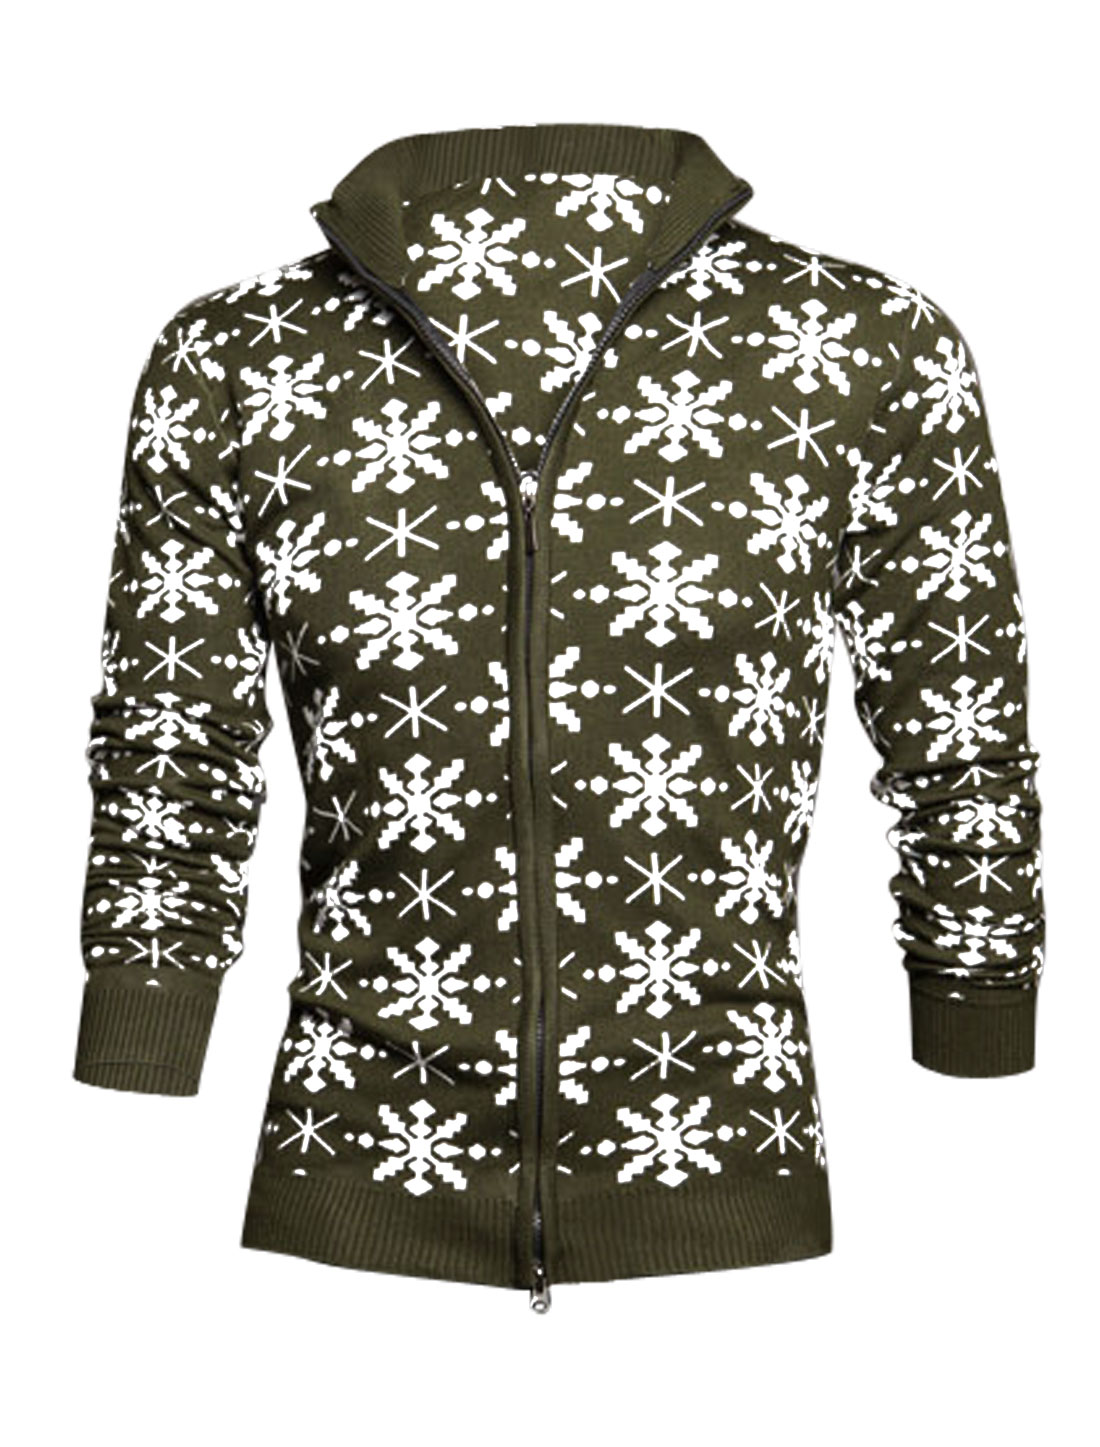 Men Convertible Collar Zip Up Stylish Cardigan Army Green S